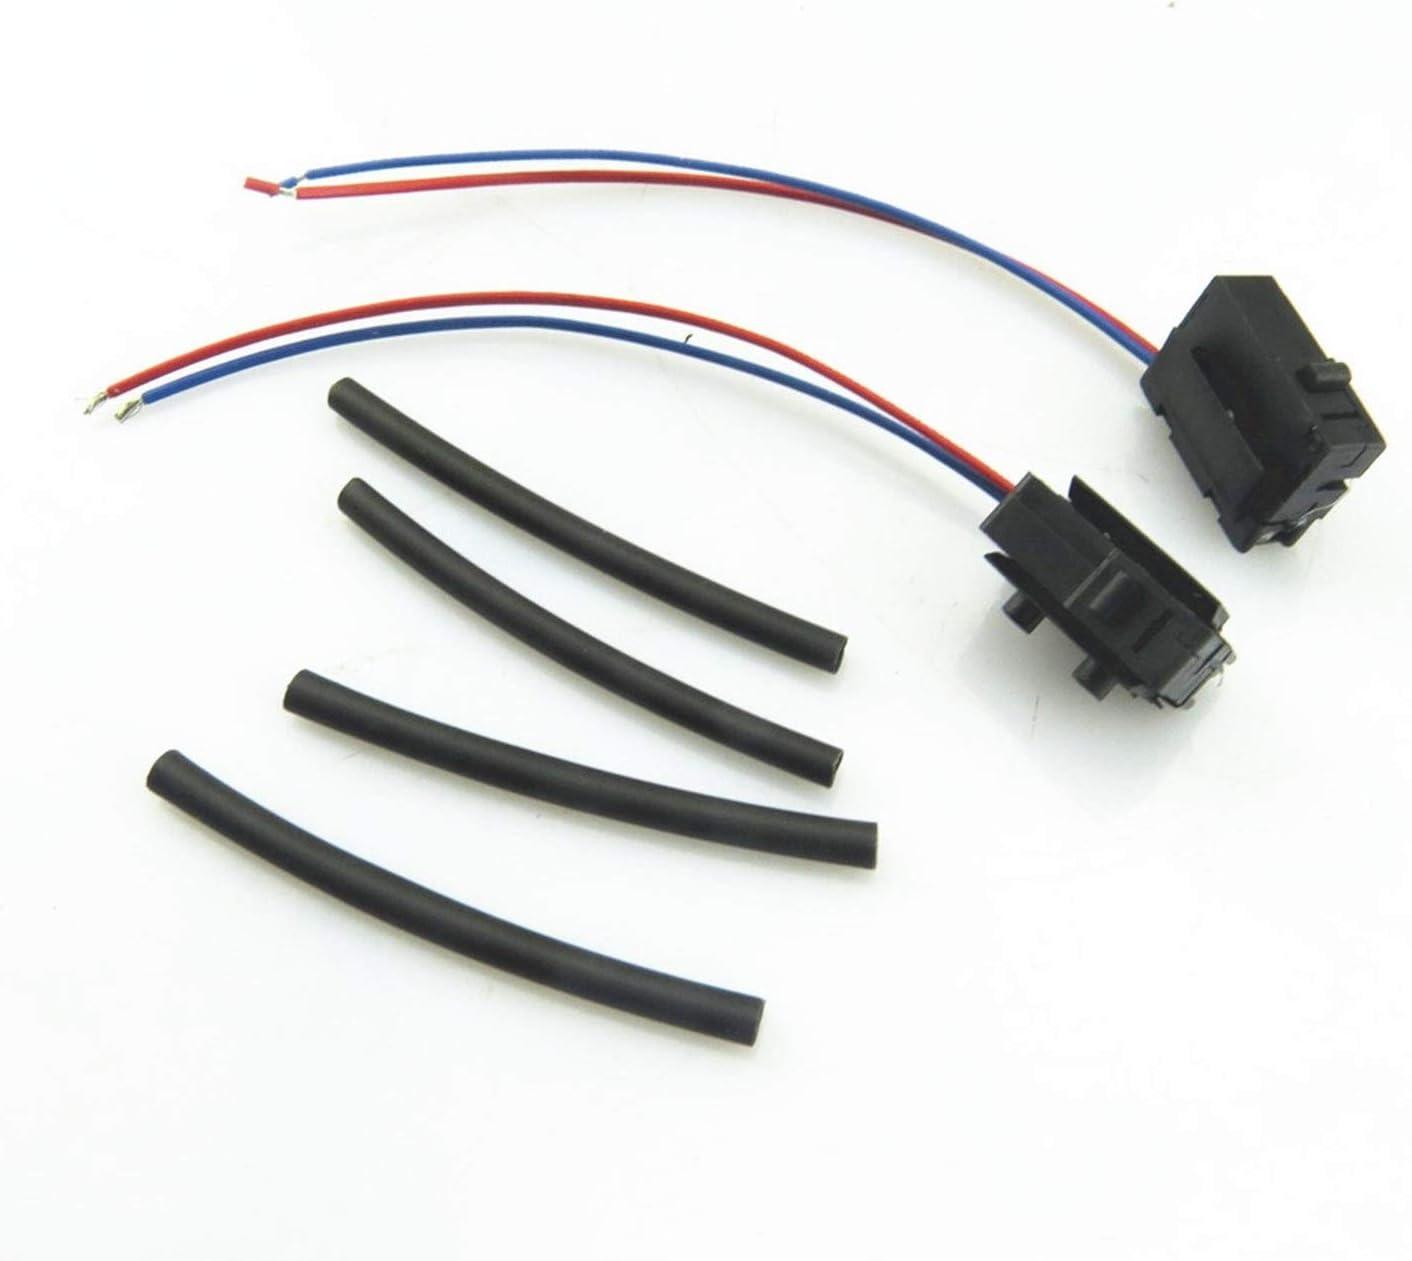 JSJJAET Micro Switch 1Pair 2021 model Door Lock Max 48% OFF Wire Plug Pipe